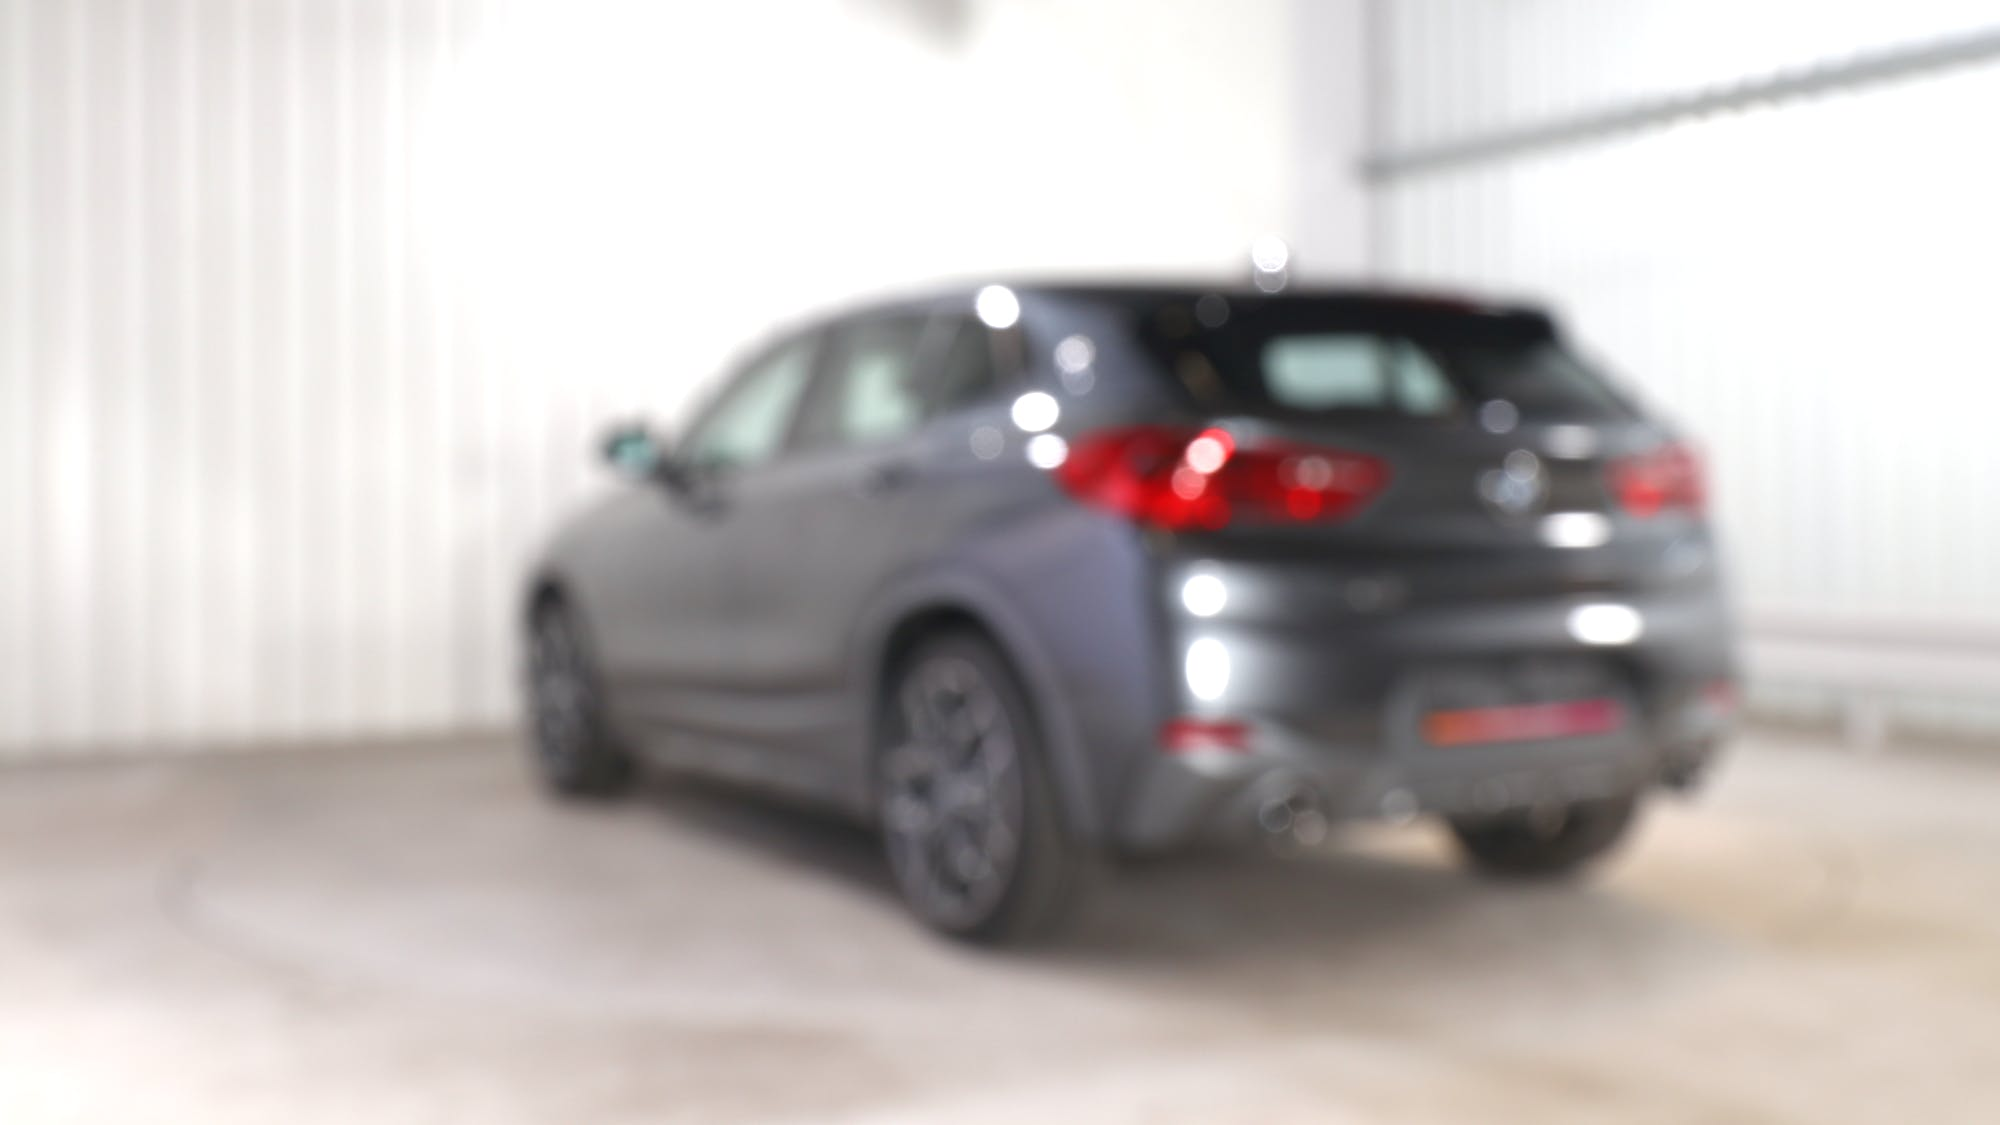 BMW X2 (F39) leasing exterior 4